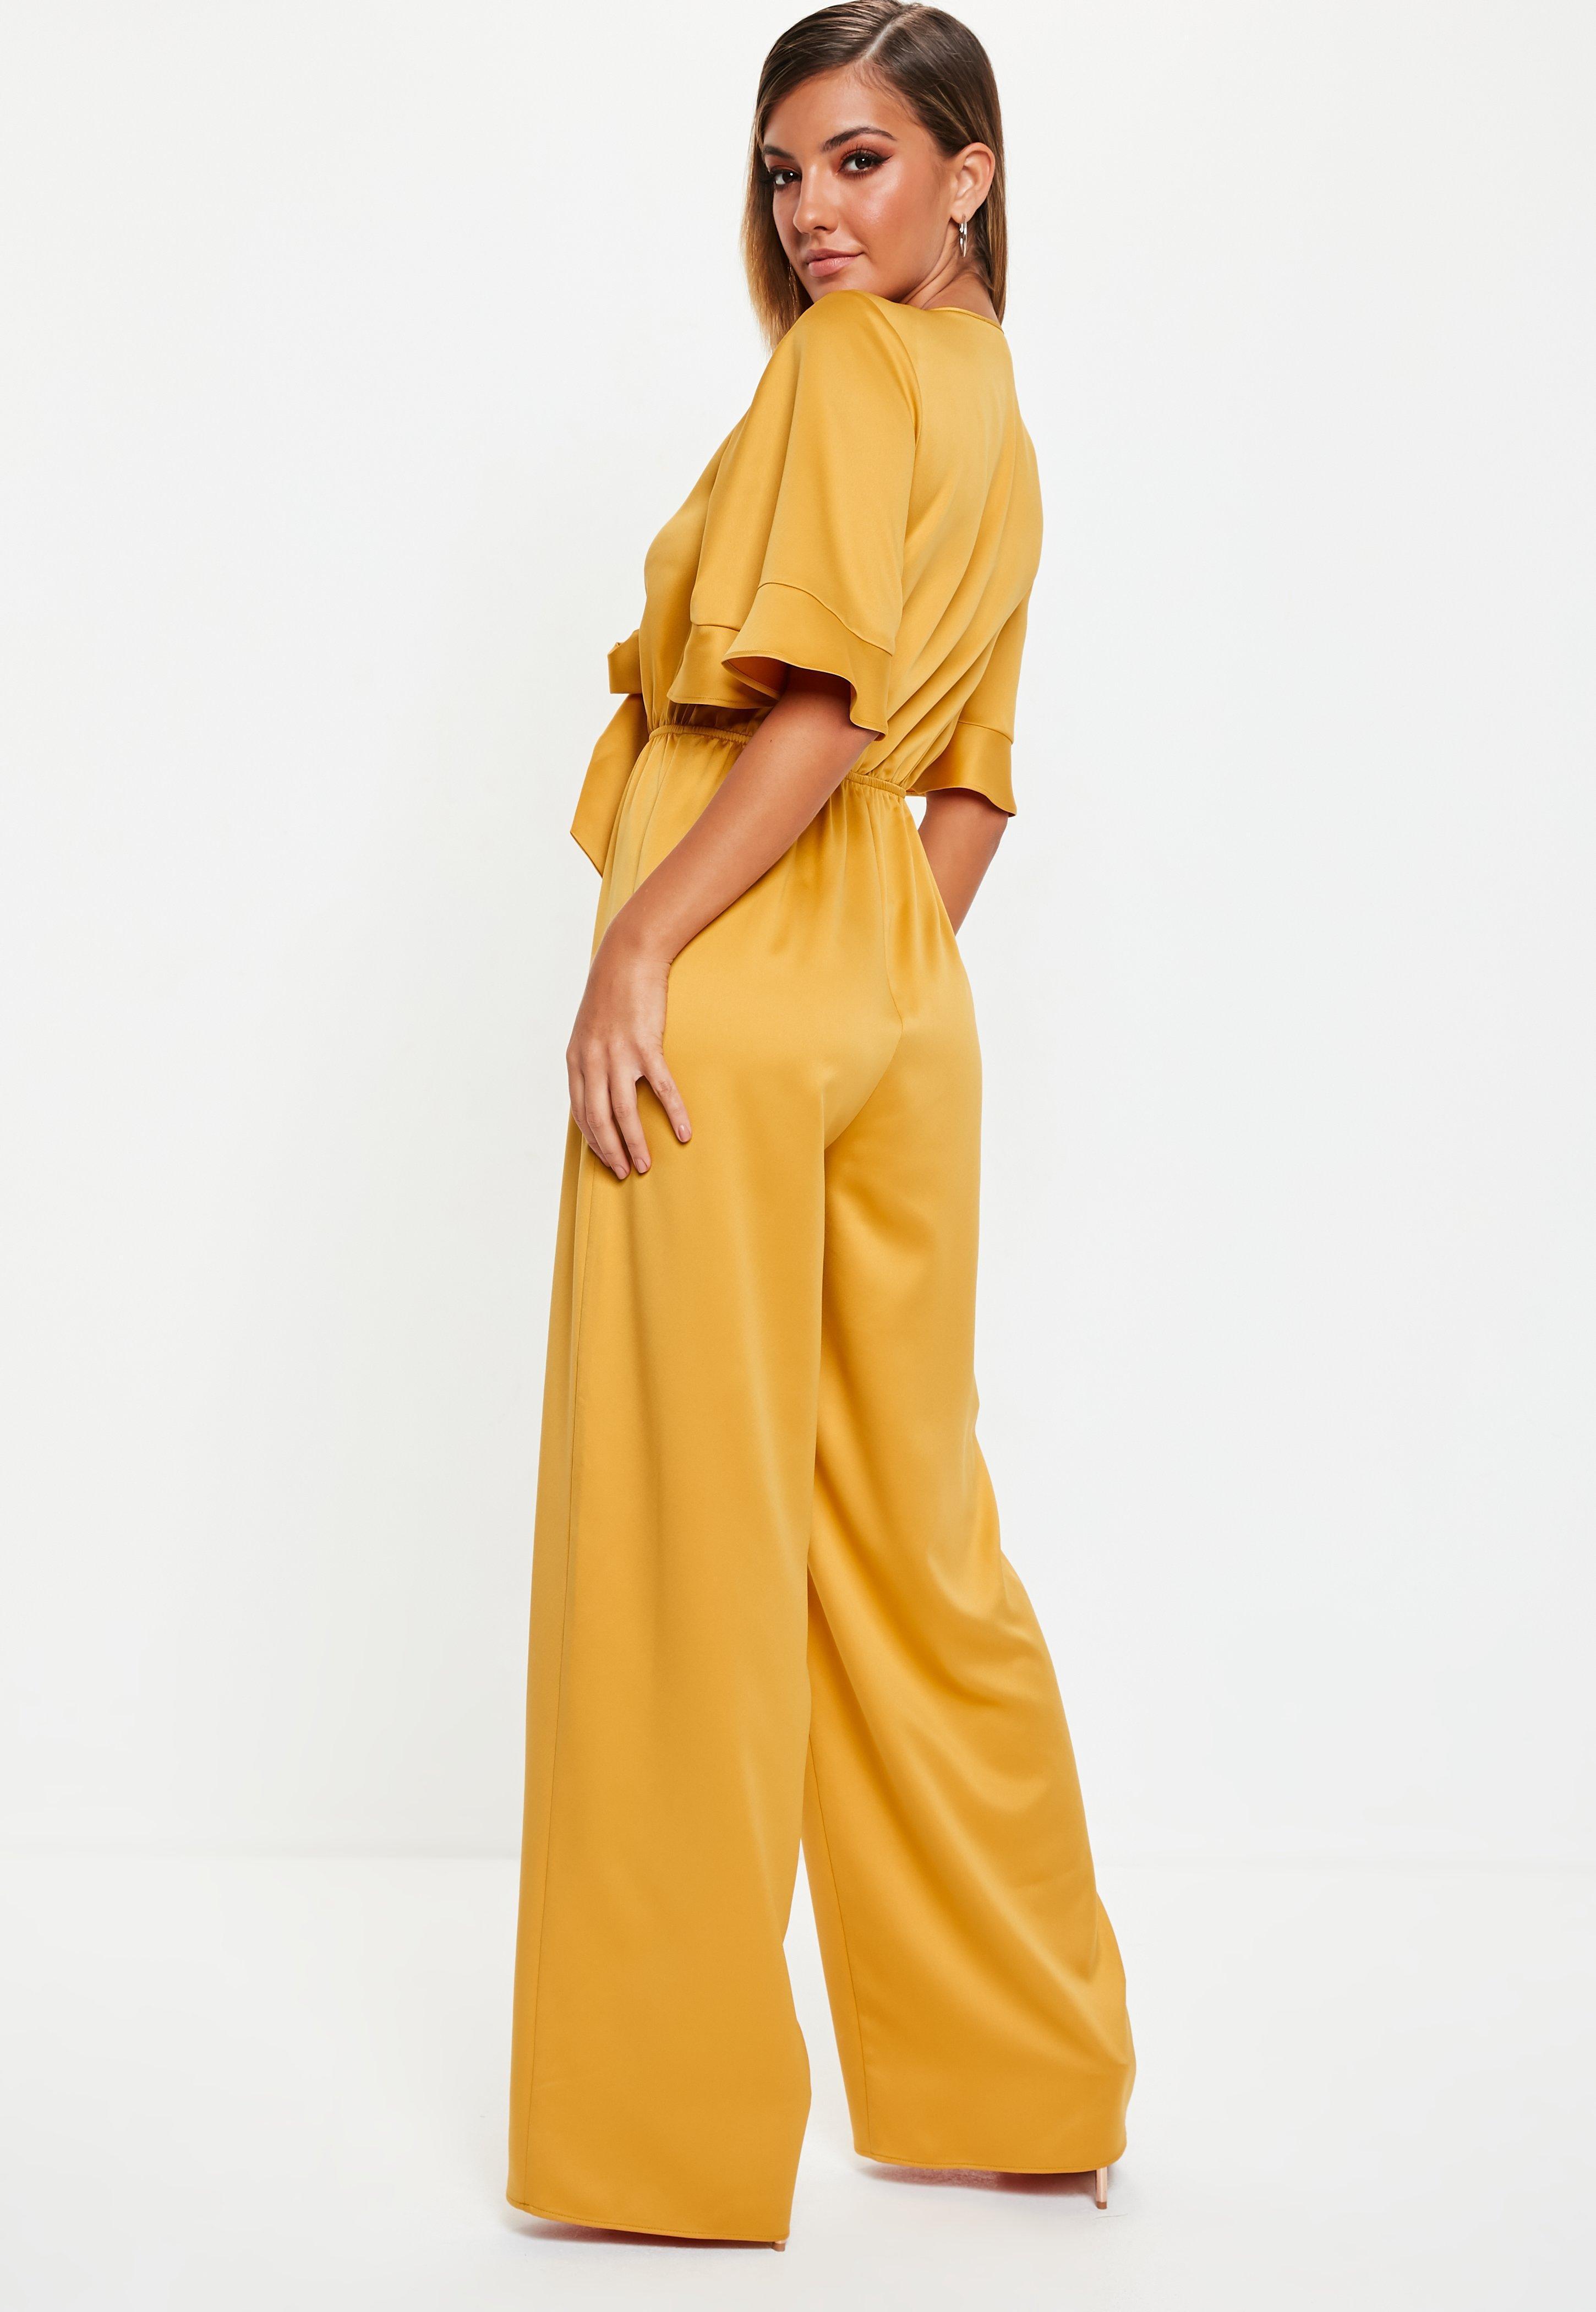 a326aad64d01 Missguided - Yellow Mustard Kimono Sleeve Satin Wide Leg Jumpsuit - Lyst.  View fullscreen